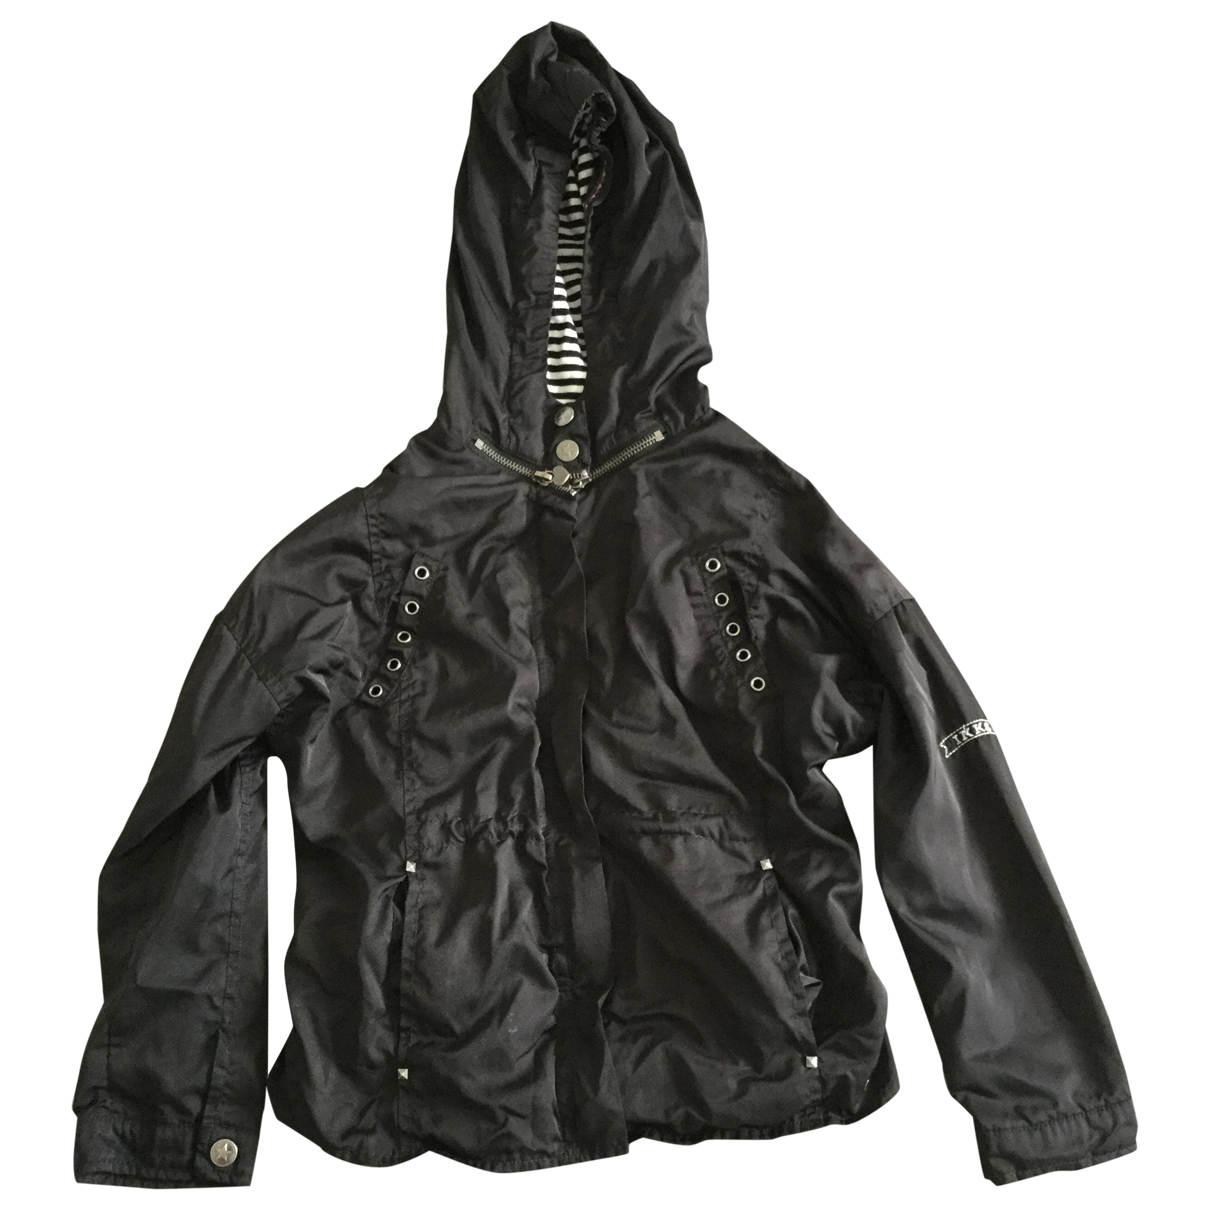 Ikks \N Black jacket & coat for Kids 8 years - up to 128cm FR